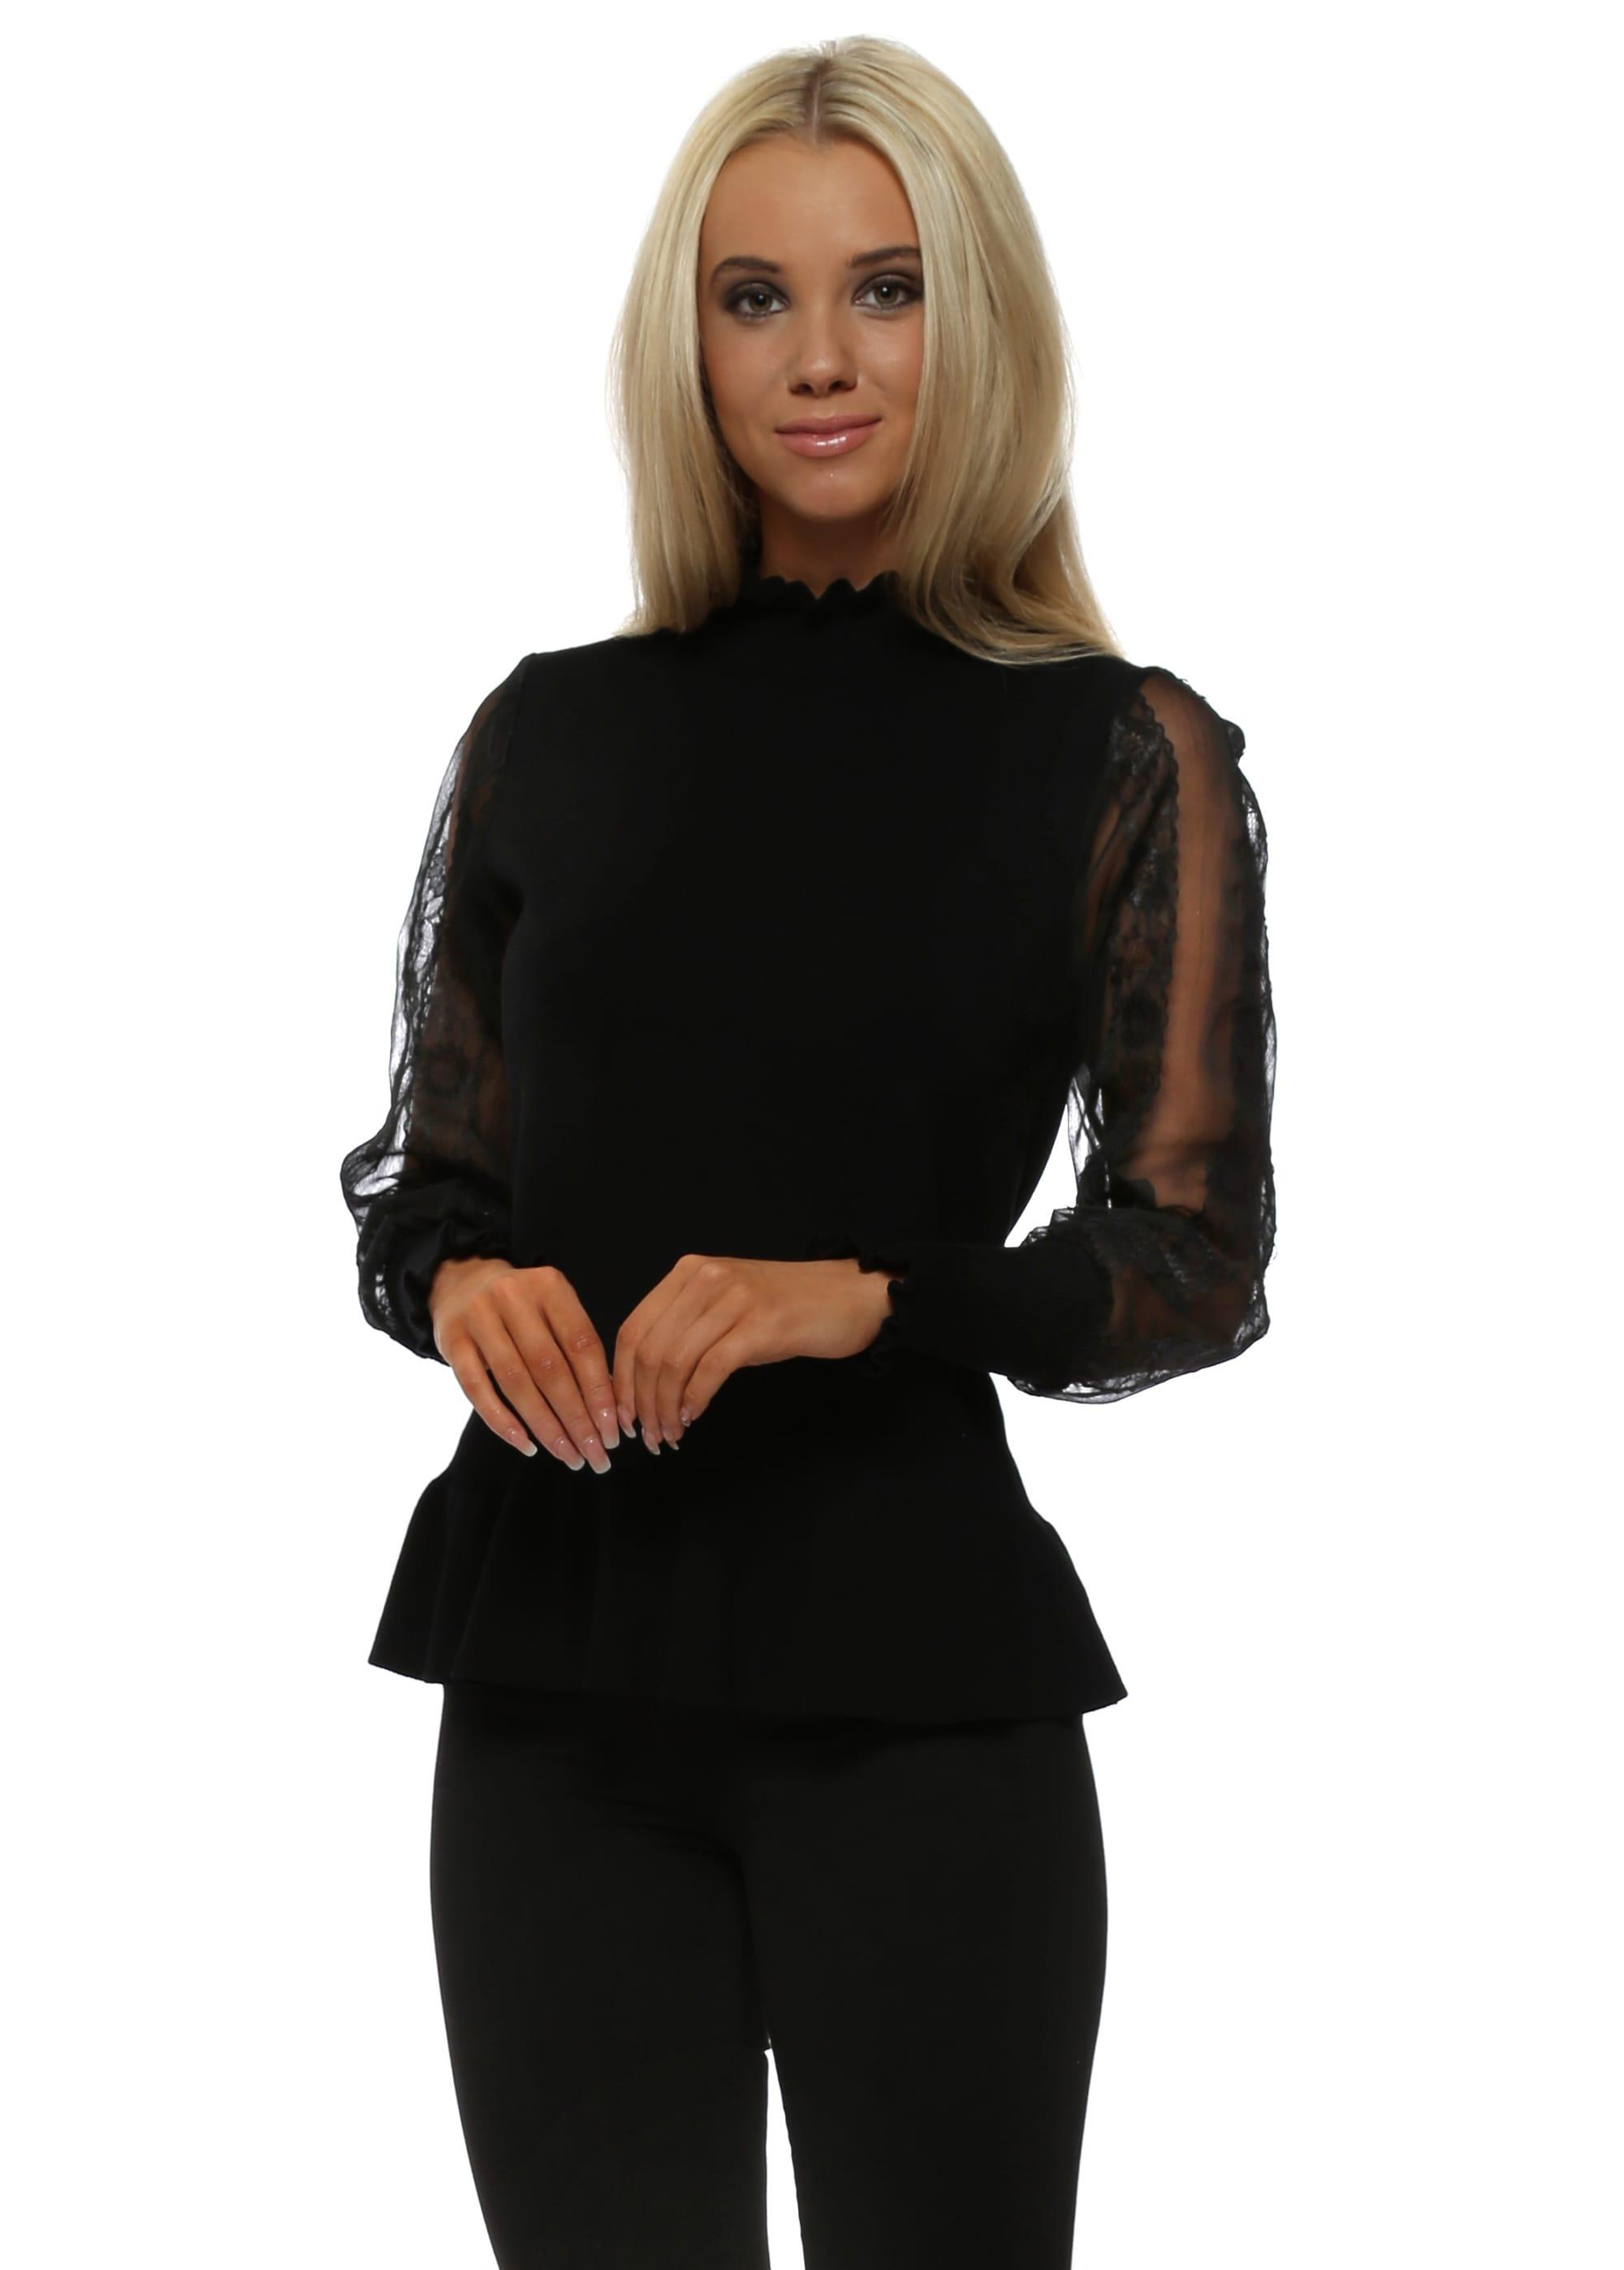 072c446a840 Black Lace Sleeve Peplum Jumper - Laetitia Mem